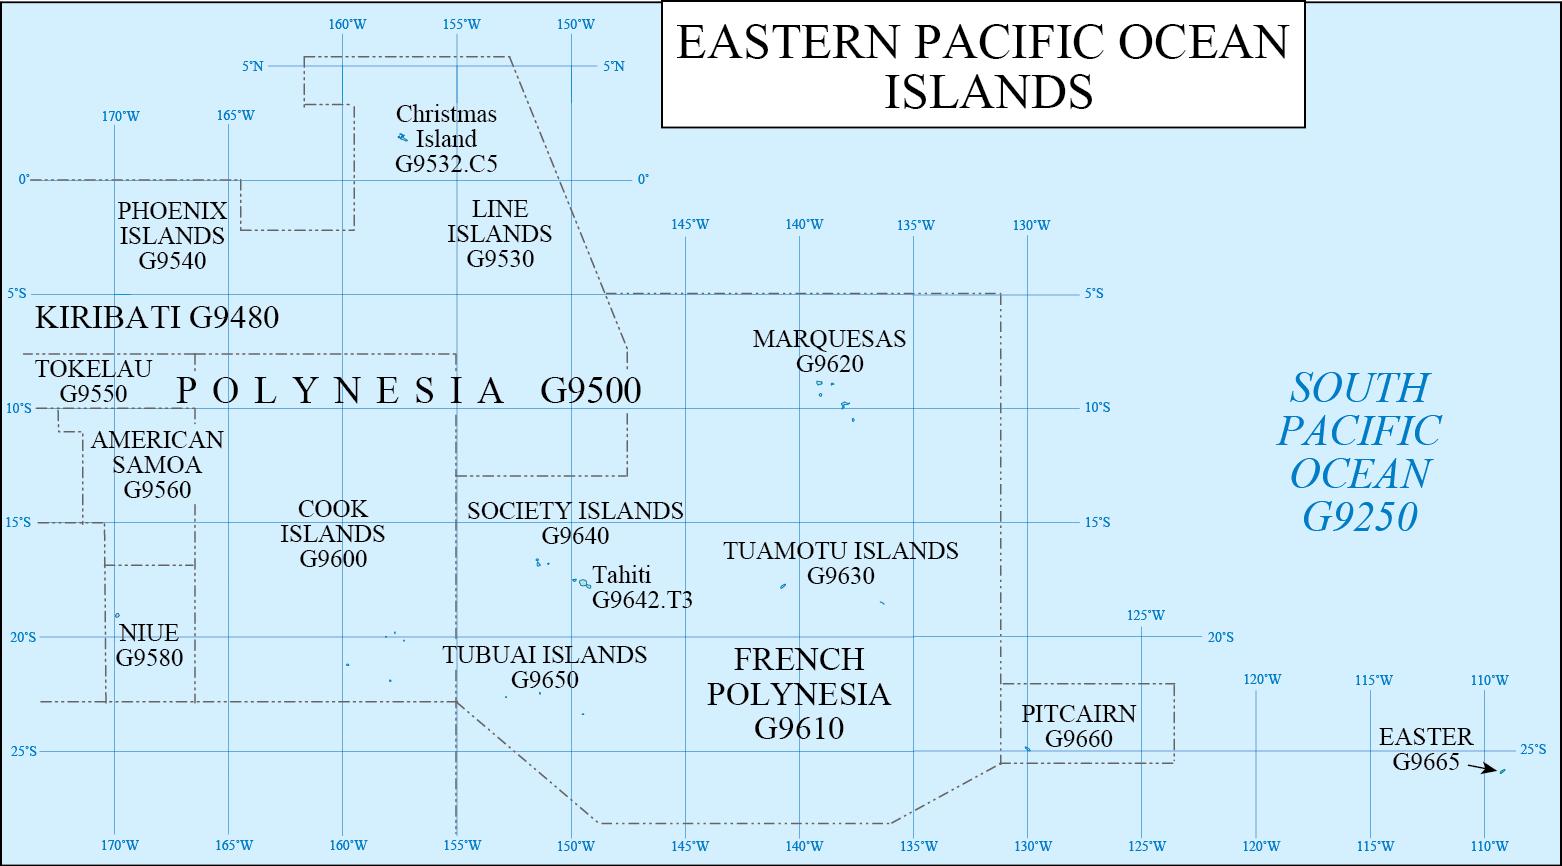 eastern pacific ocean map Lc G Schedule Map 43 Eastern Pacific Ocean Waml Information eastern pacific ocean map